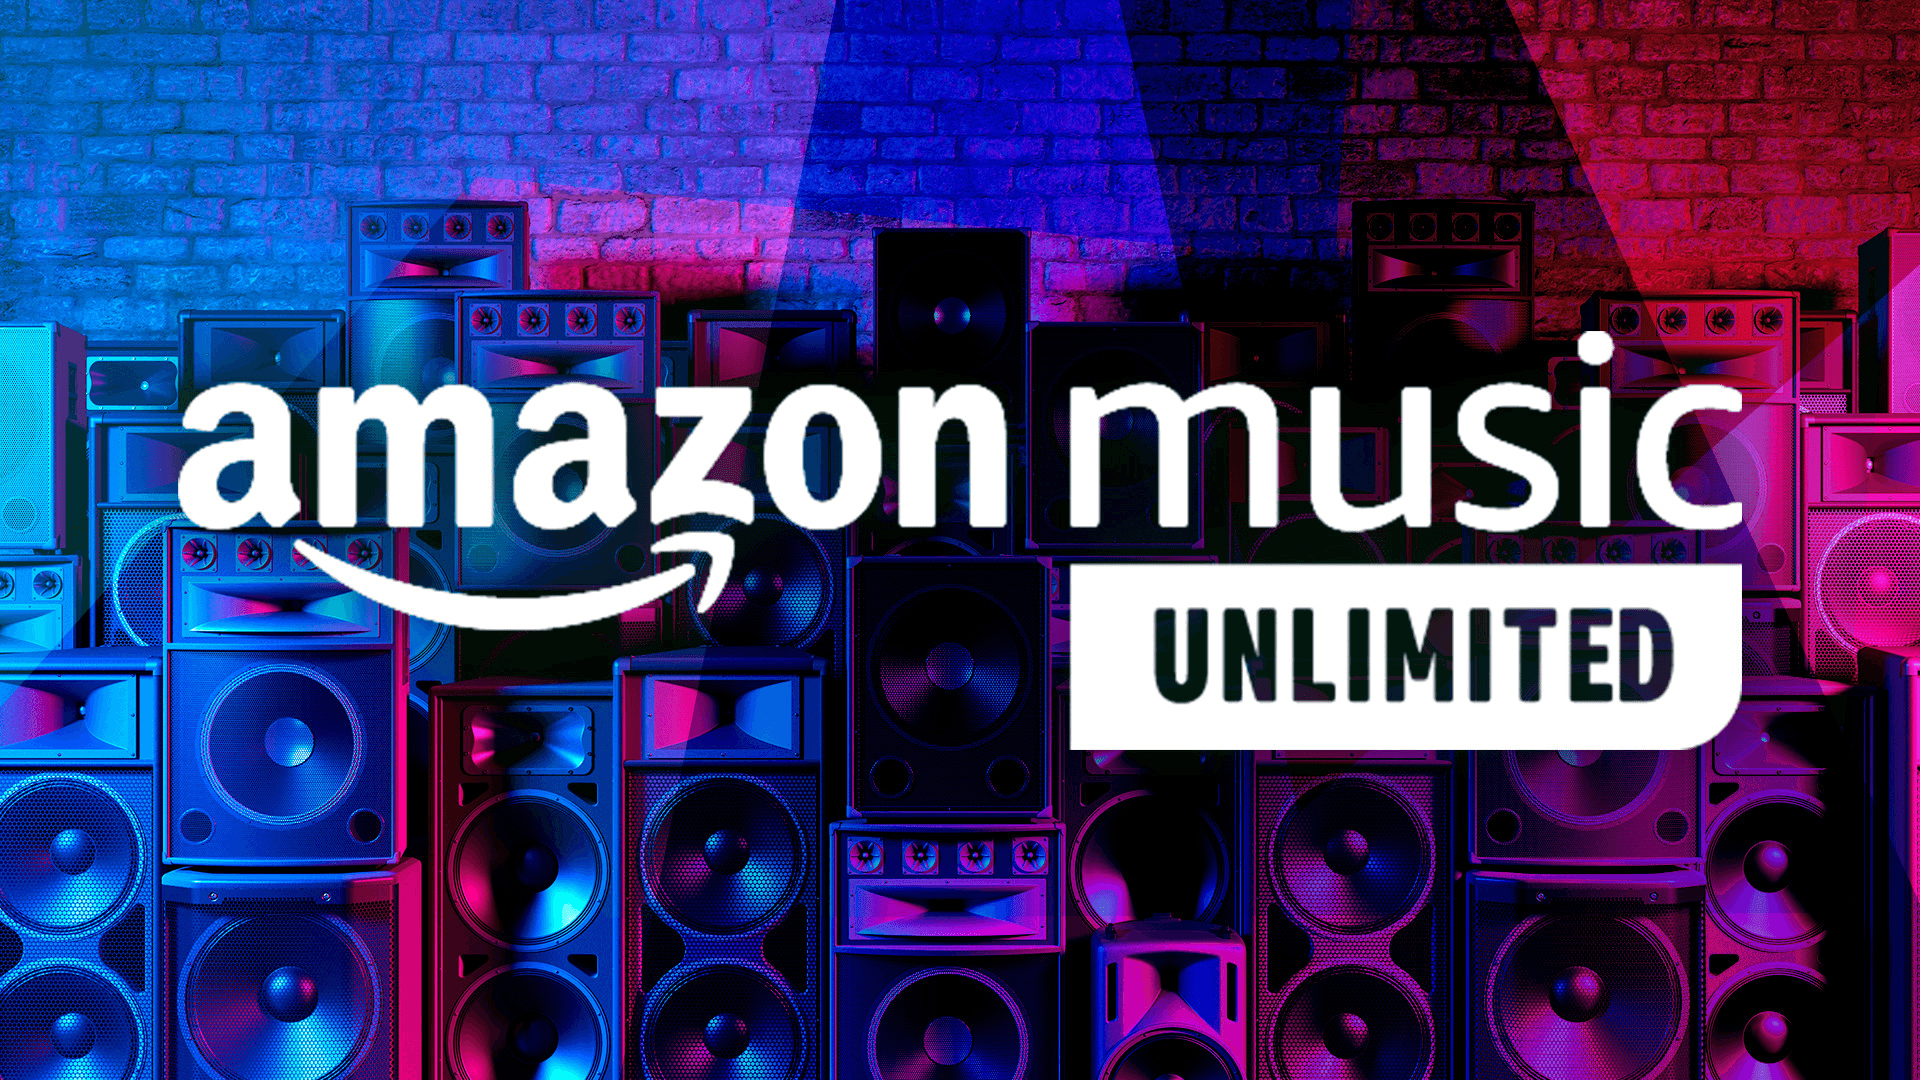 Streaming, Amazon, Logo, Musik, Amazon Prime, Musik-Streaming, musikstreaming, Flatrate, Musikdienst, Prime, Amazon Music, Musik-Plattform, Musikflat, Amazon Music Unlimited, Flat, Prime Music, Music Unlimited, Musik Unlimited